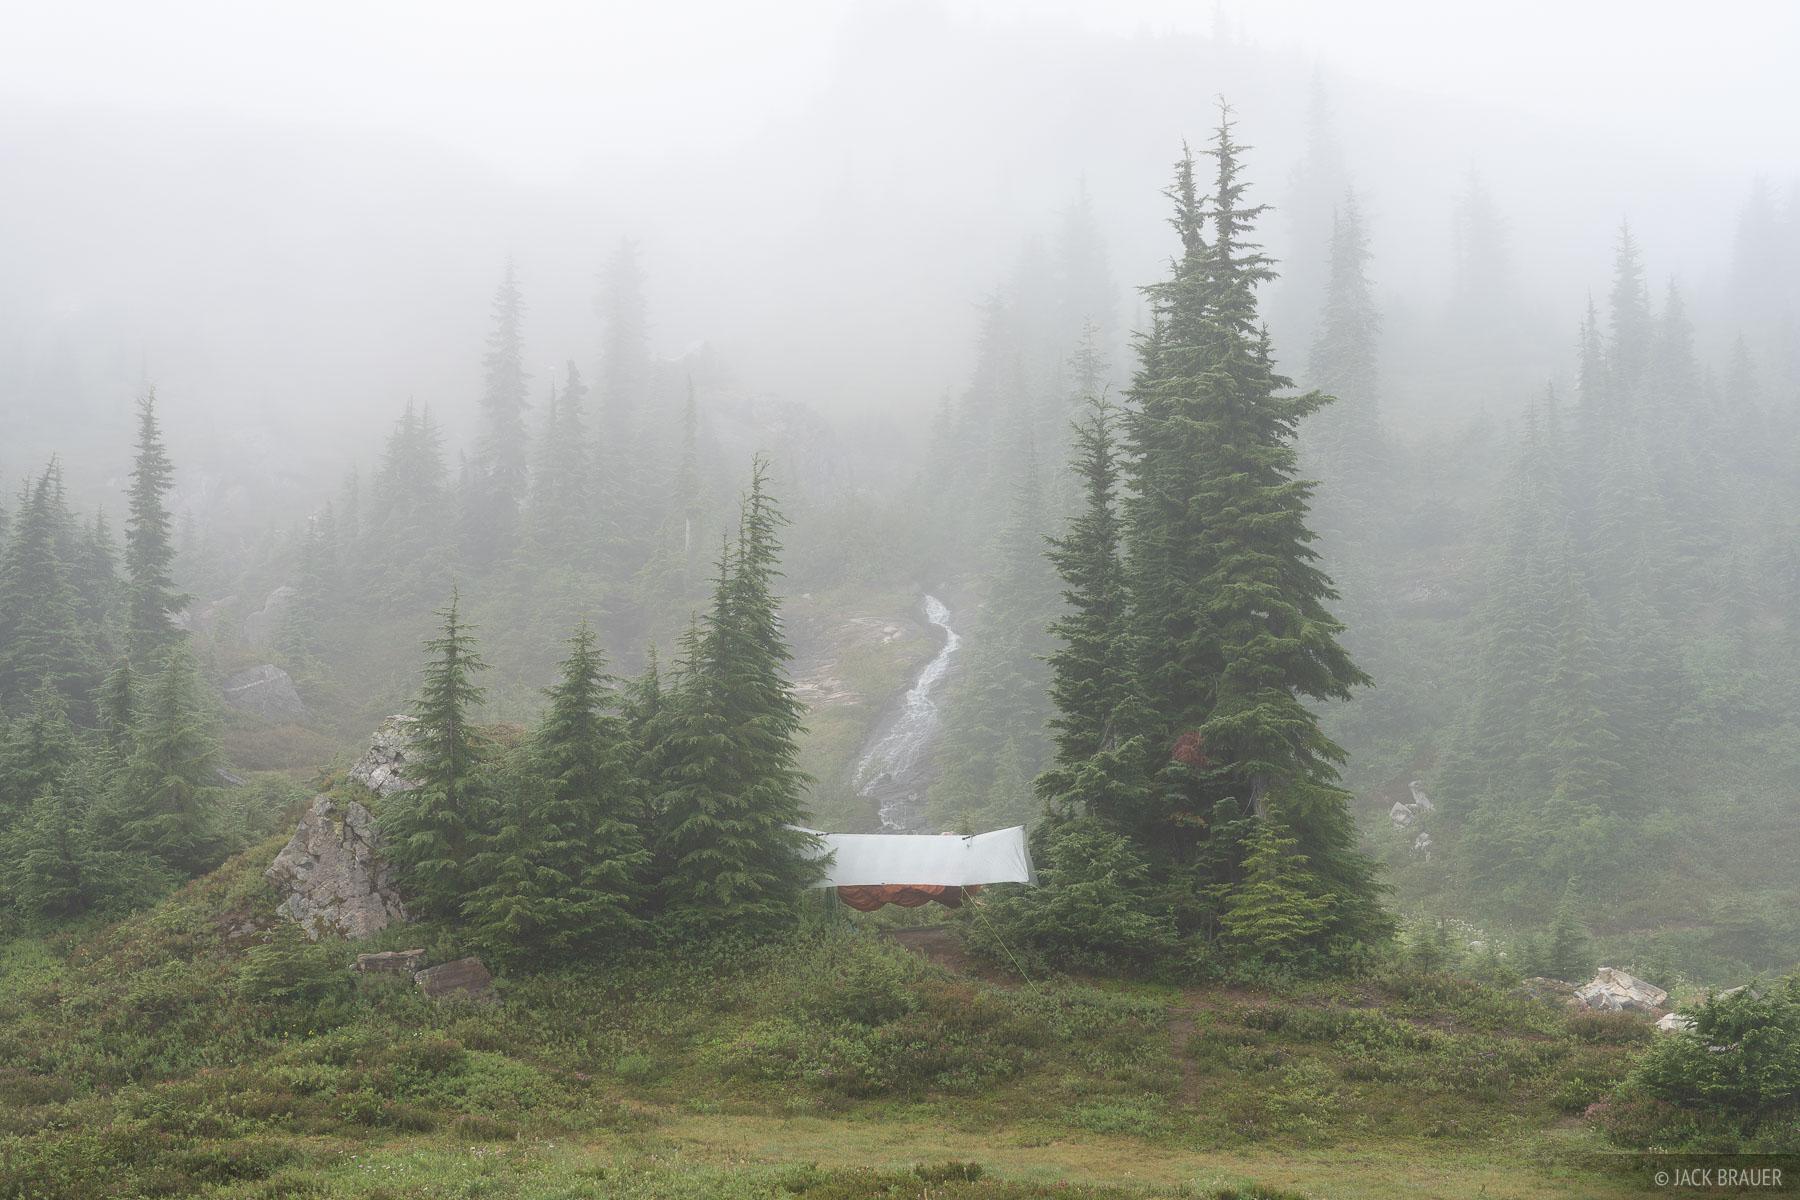 Glacier Peak Wilderness, Washington, hammock, Cascades, photo